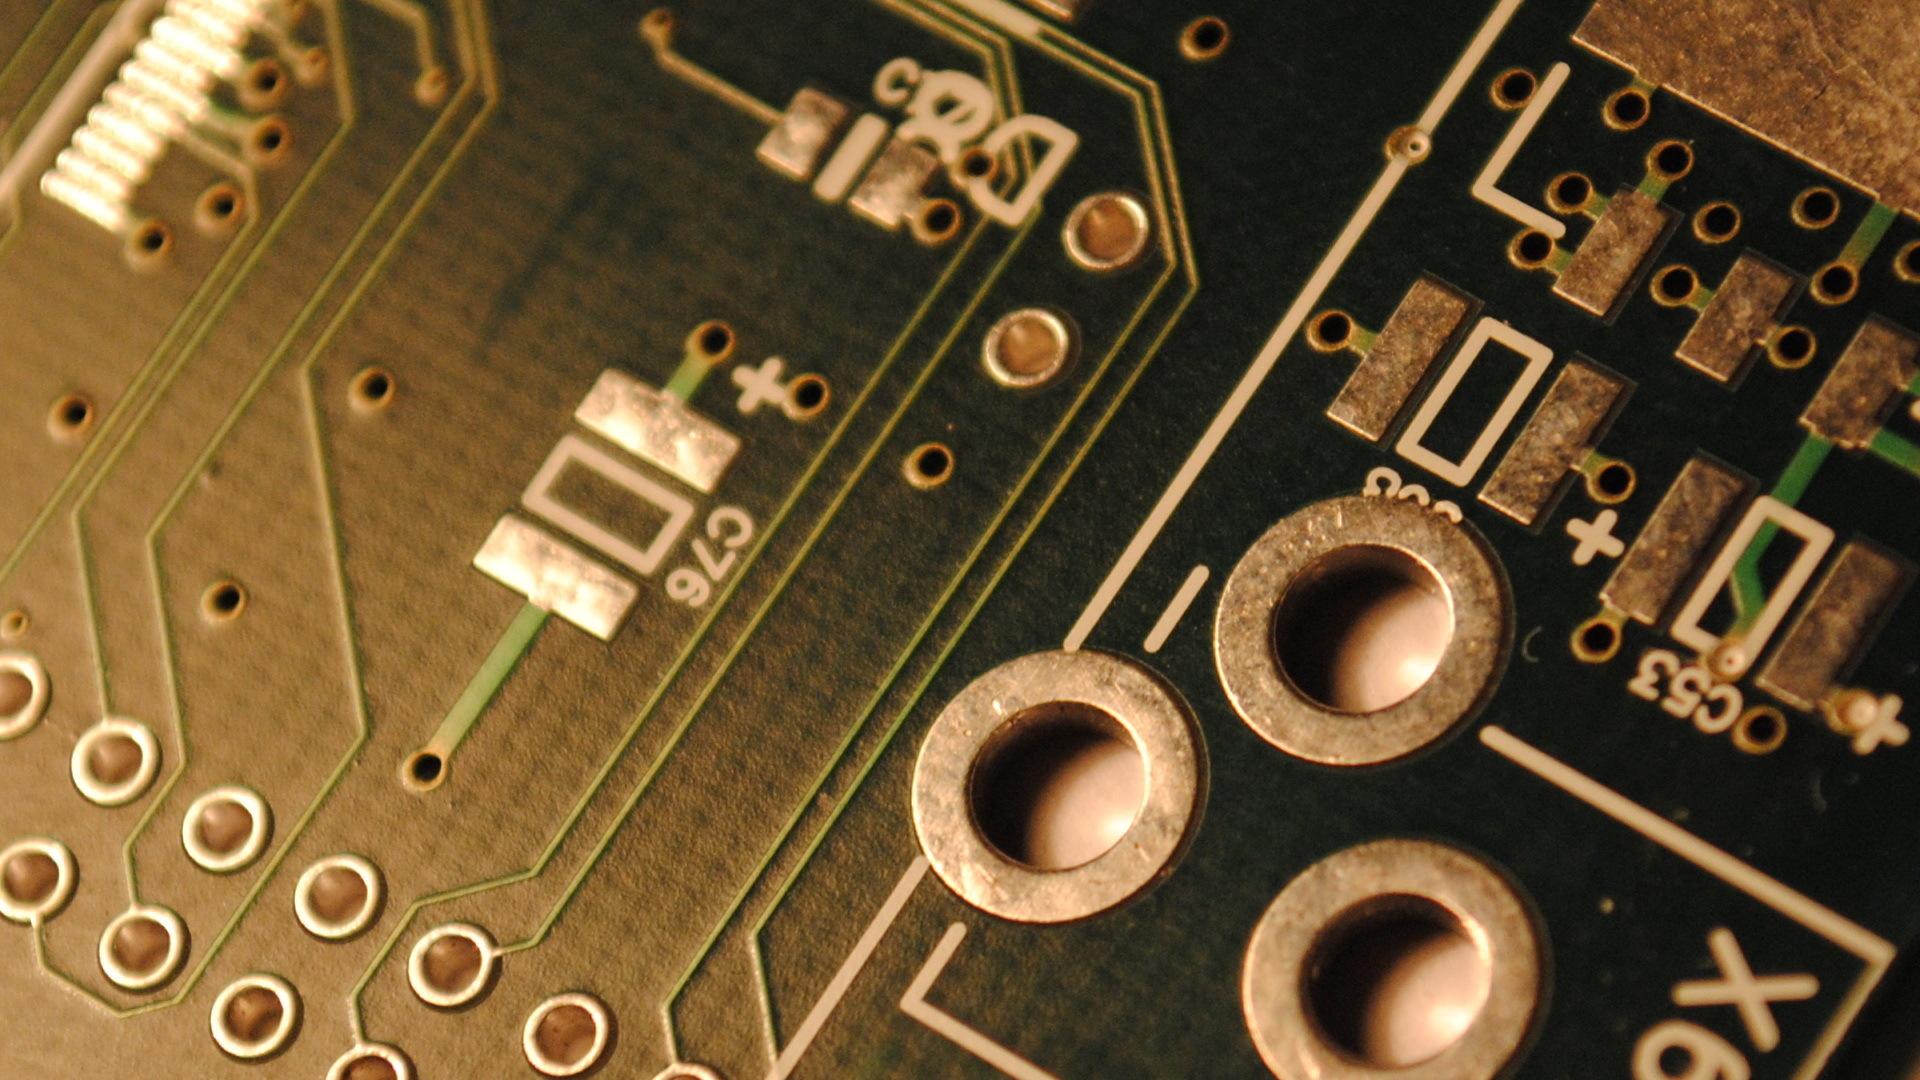 Electronics Wallpapers Hd: Electronic Wallpaper Desktop